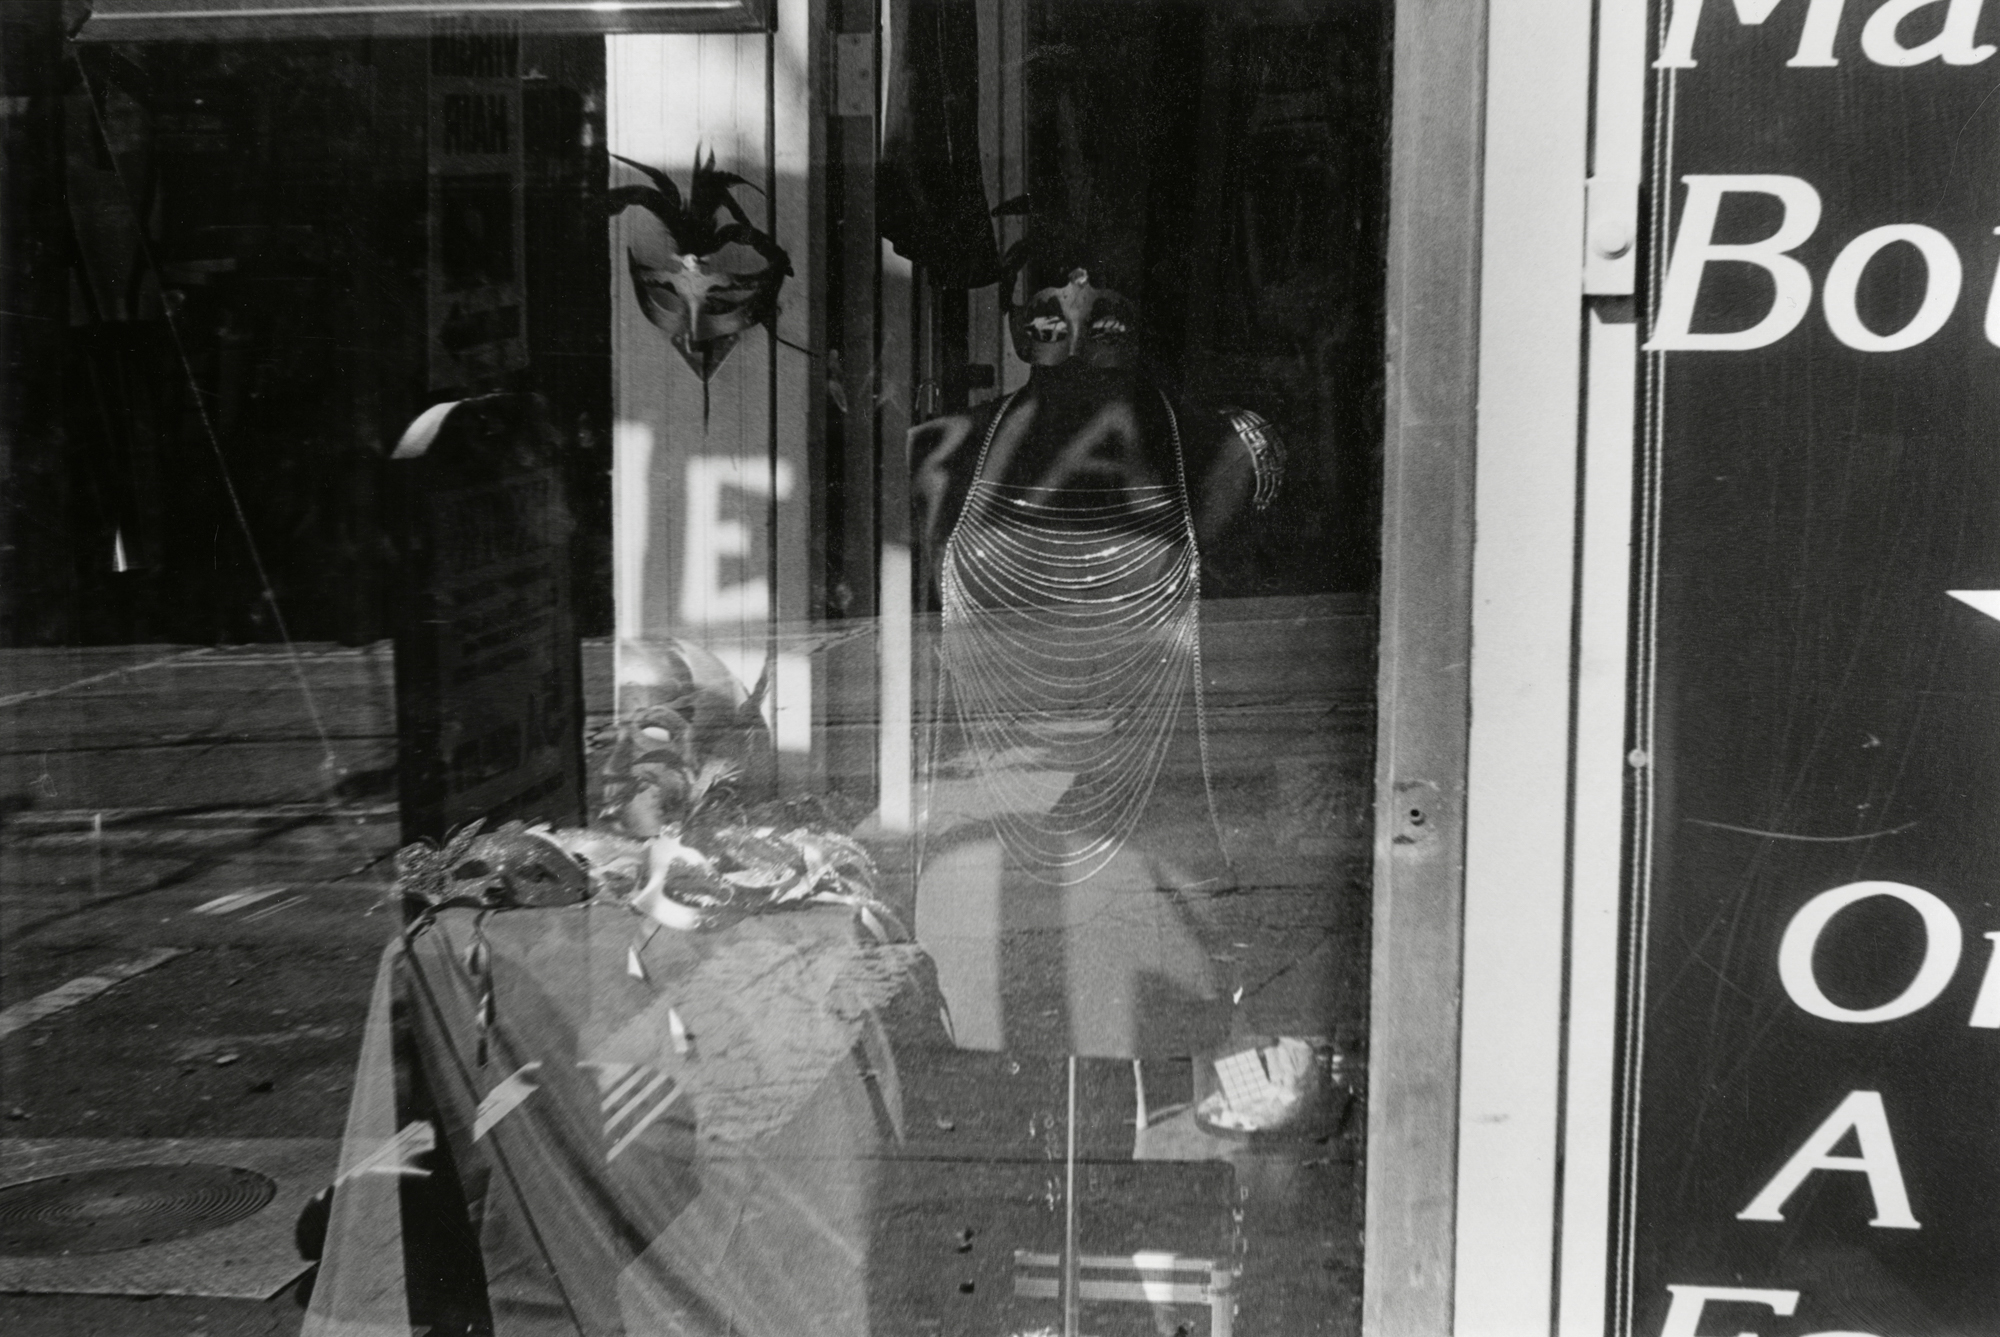 Penelope_Stone-Window_Shopping-20.jpg